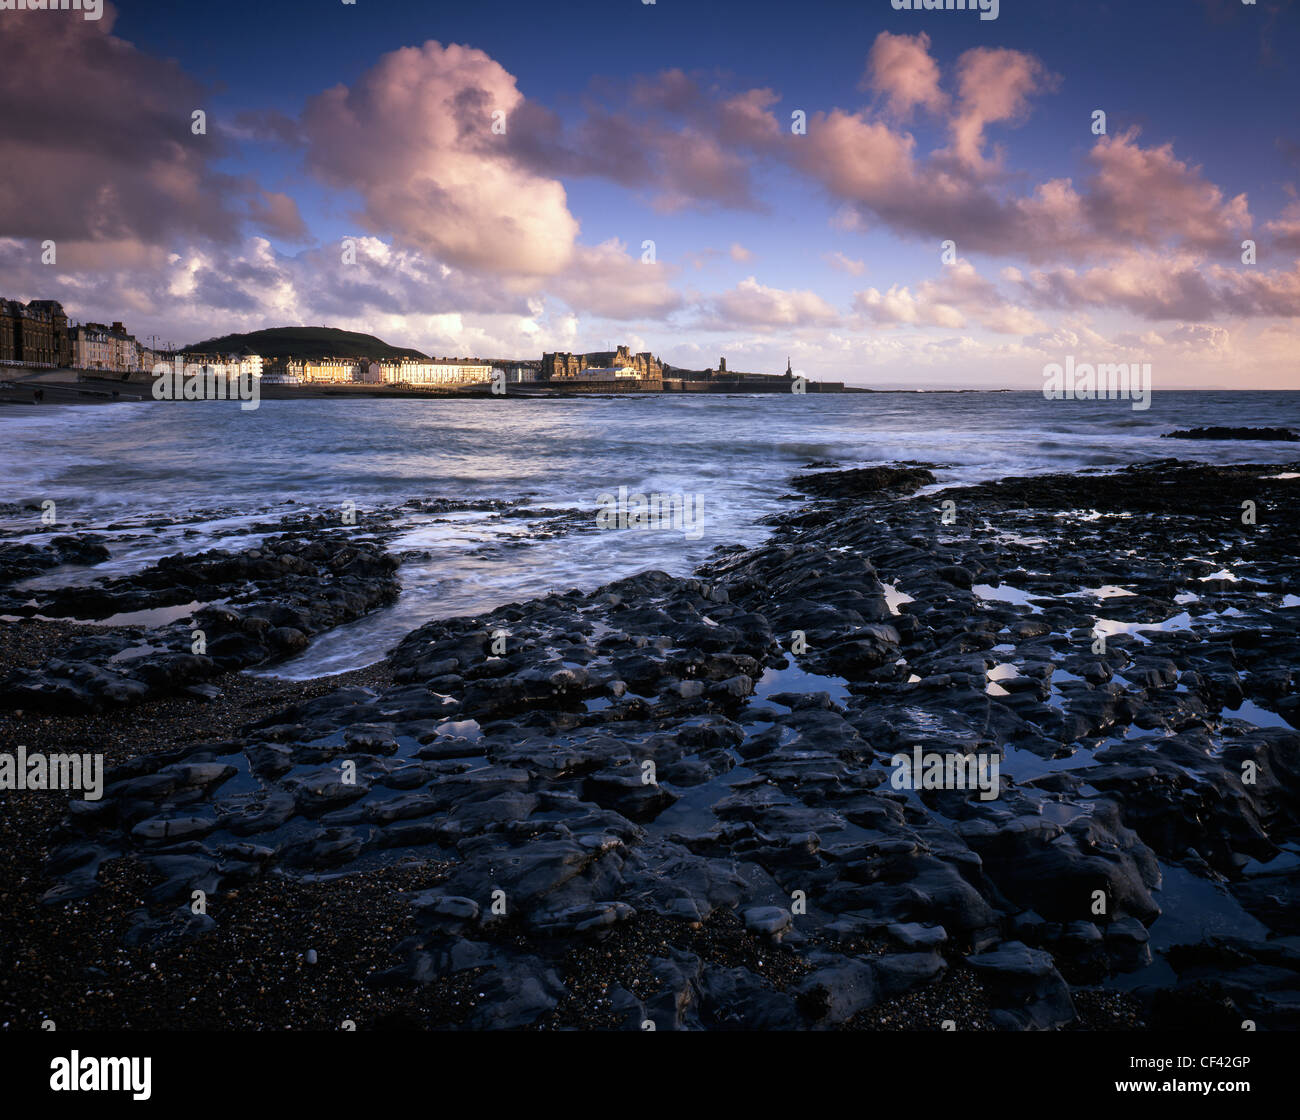 Looking across Cardigan Bay towards Aberytswyth's Victorian promenade. - Stock Image